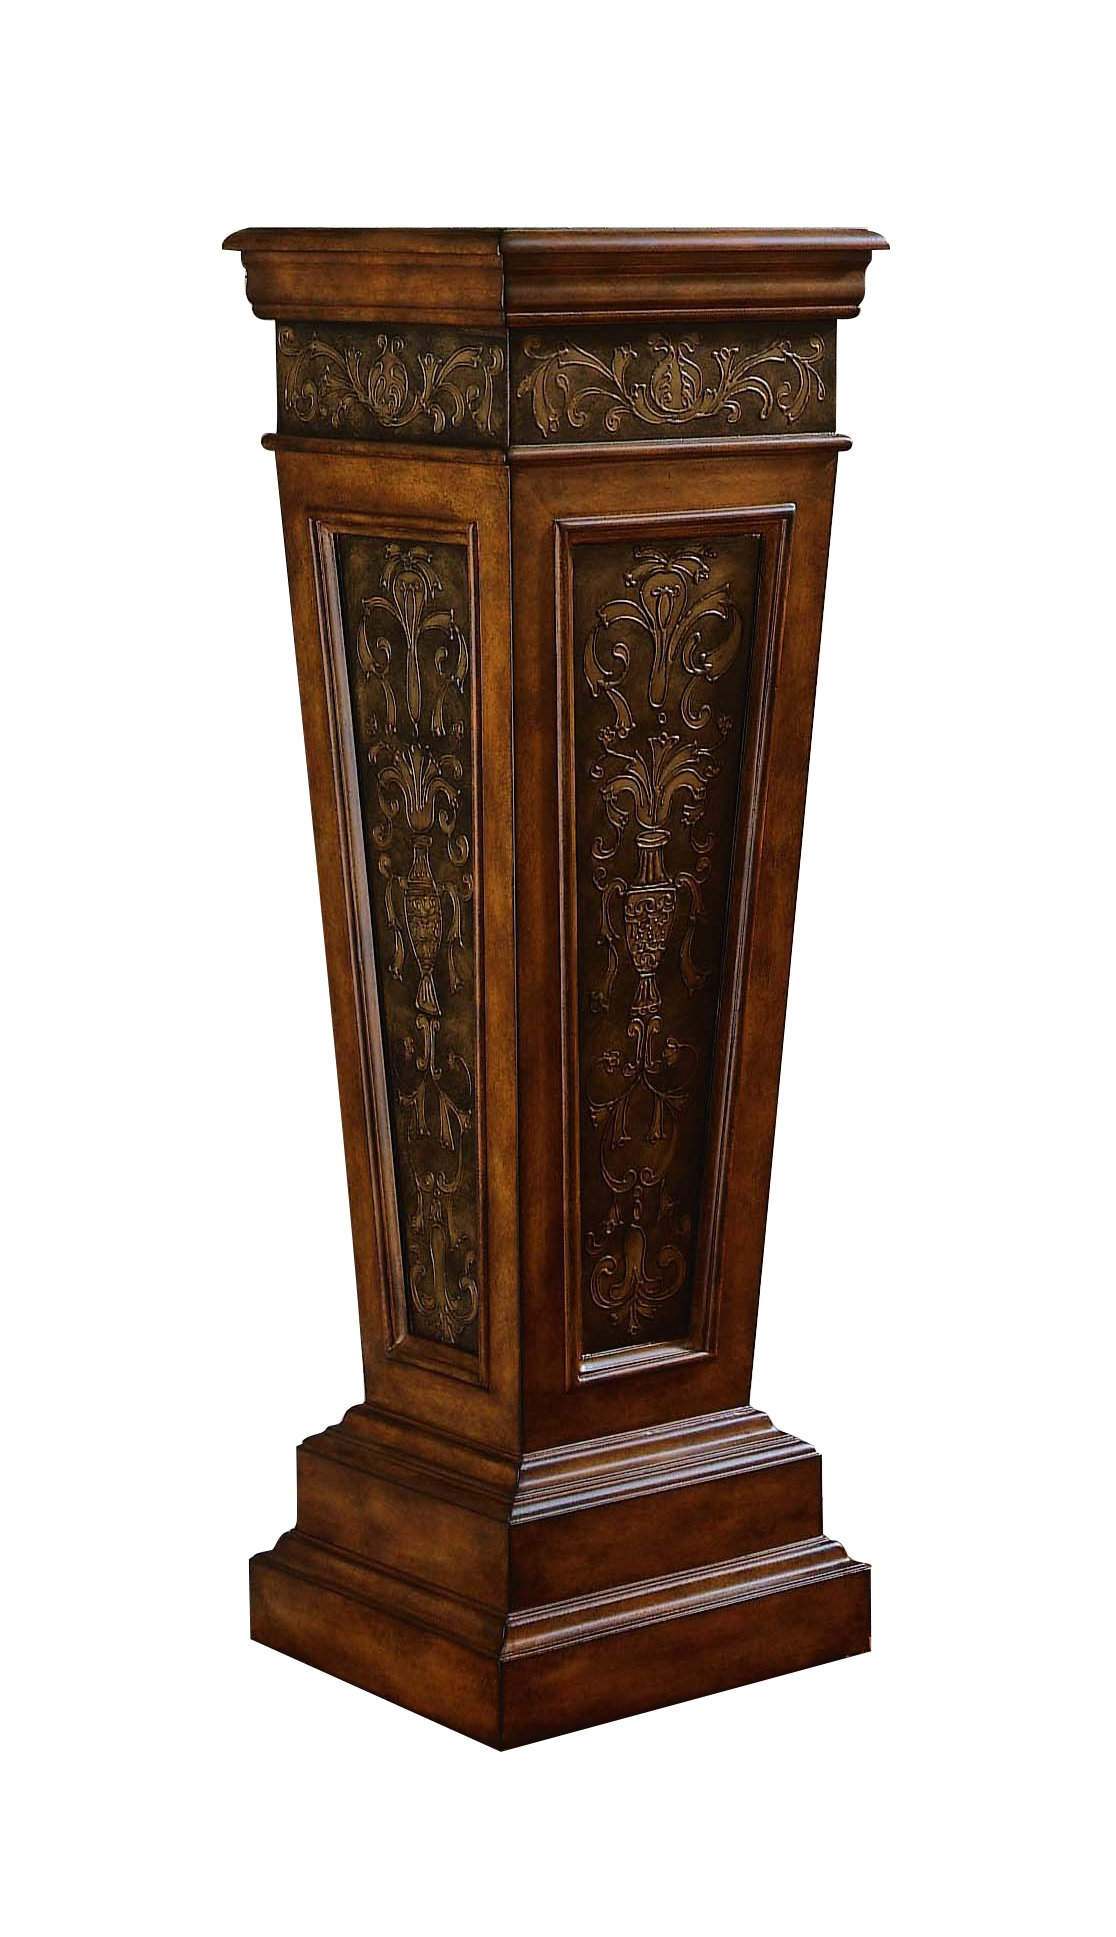 Pulaski Pedestal Table by Pulaski